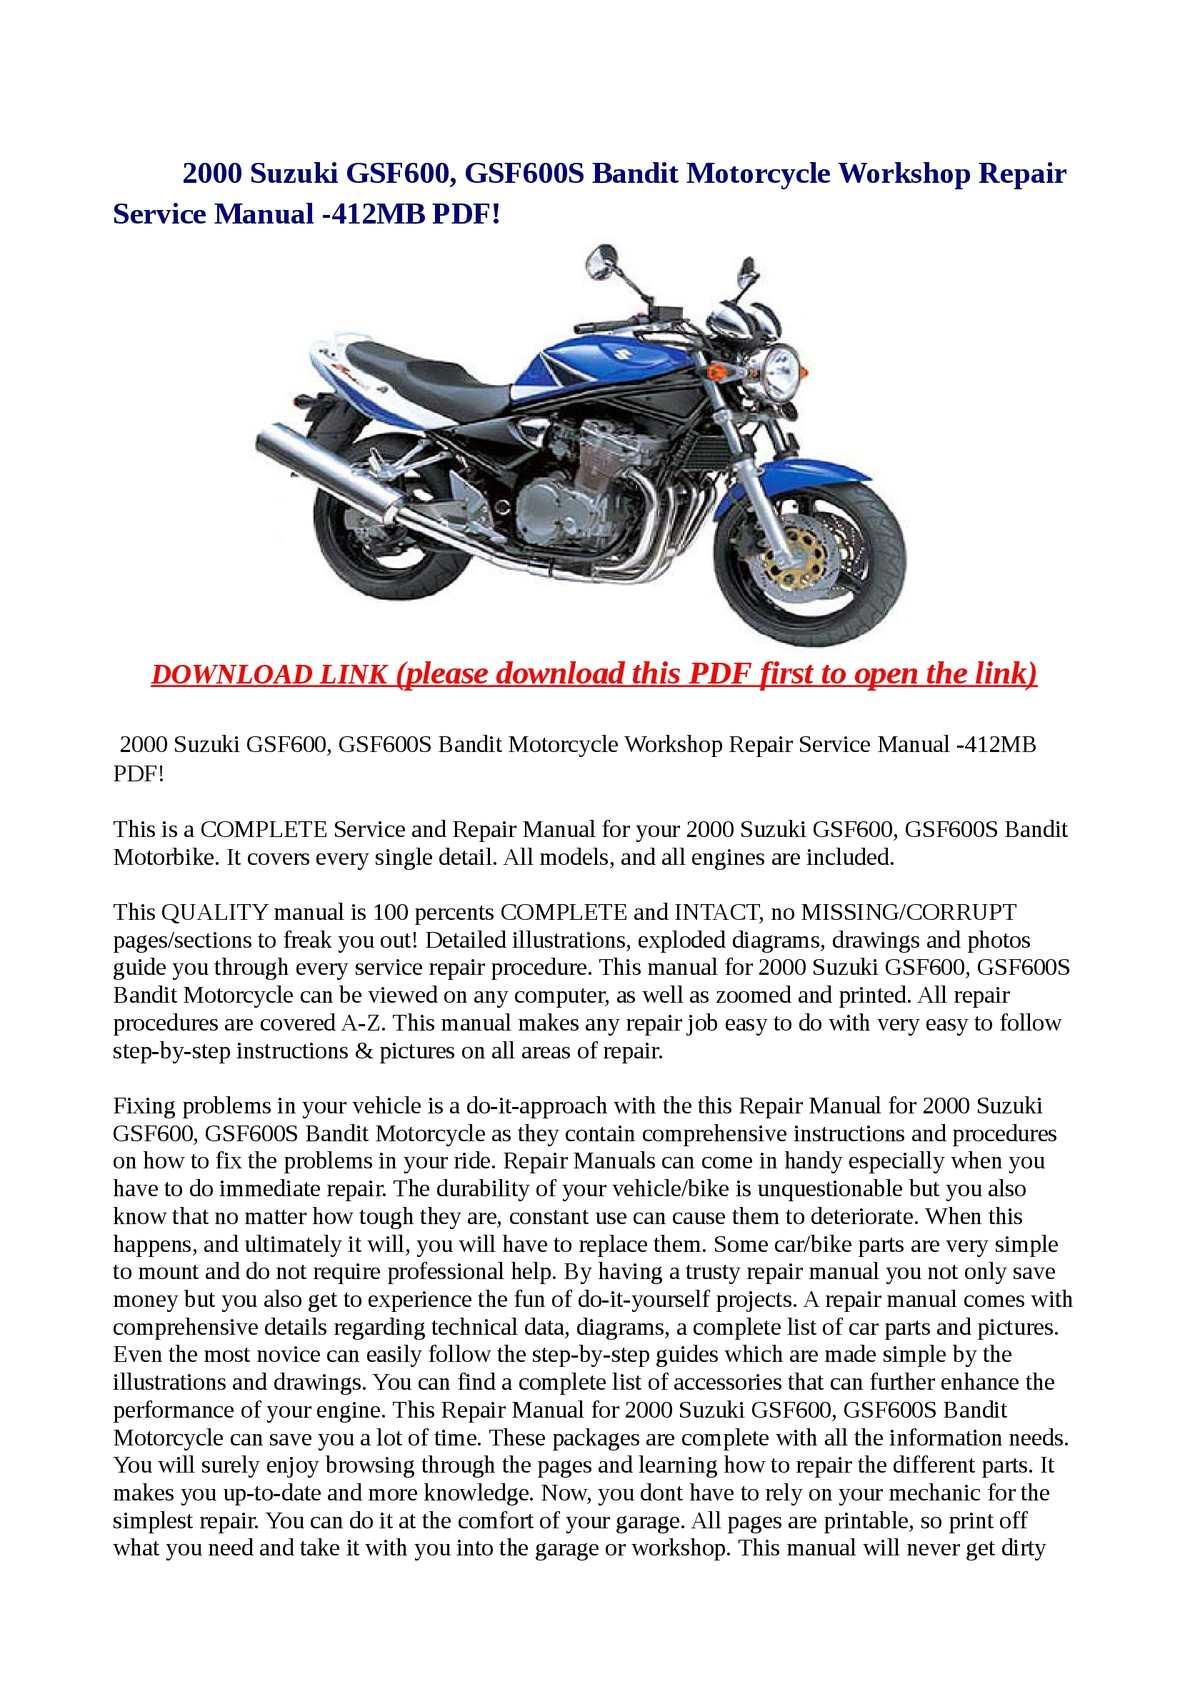 Calaméo - 2000 Suzuki GSF600, GSF600S Bandit Motorcycle Workshop Repair  Service Manual -412MB PDF!